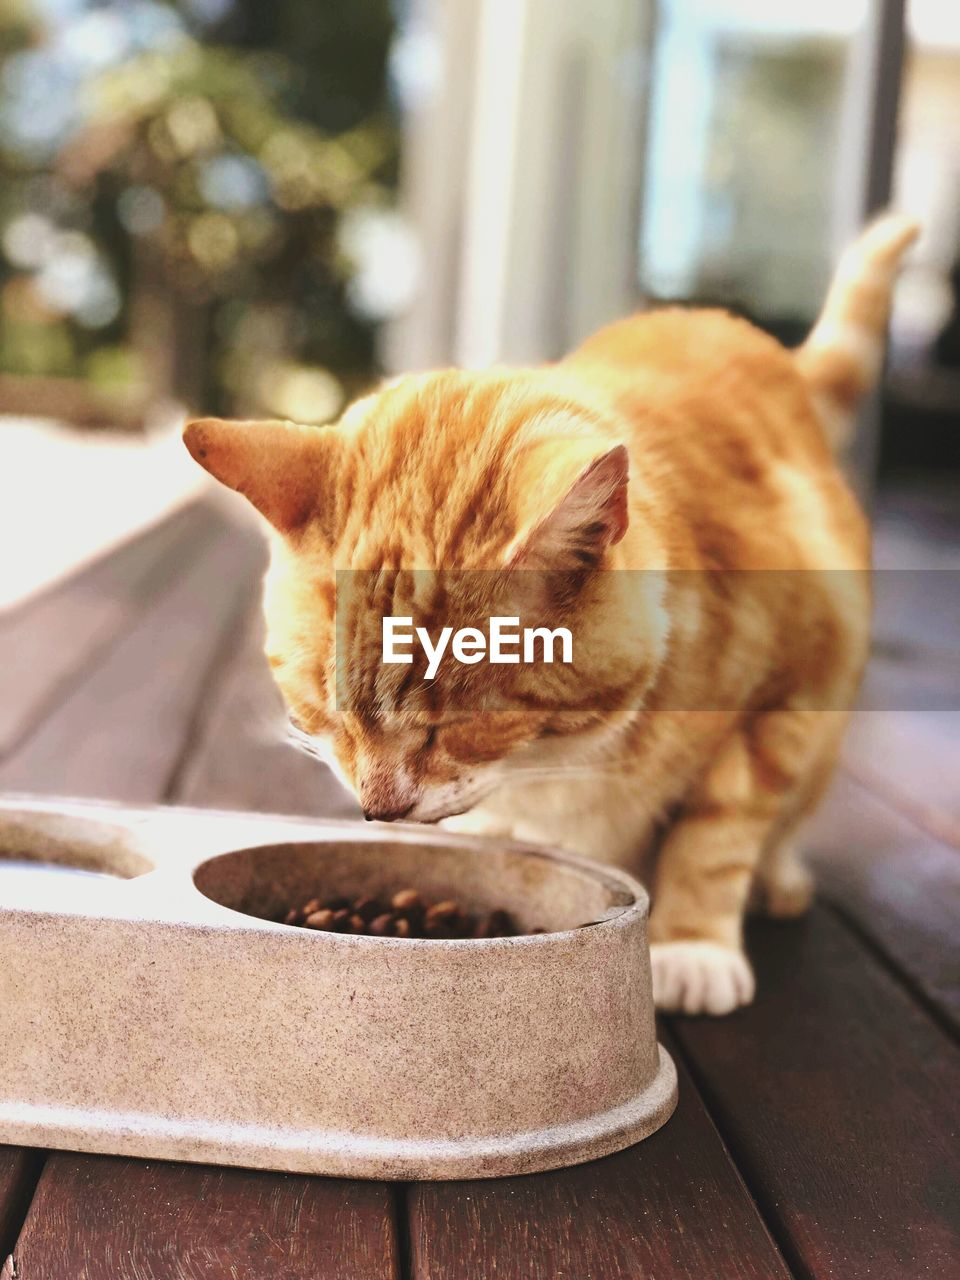 CLOSE-UP OF A CAT IN A PLATE